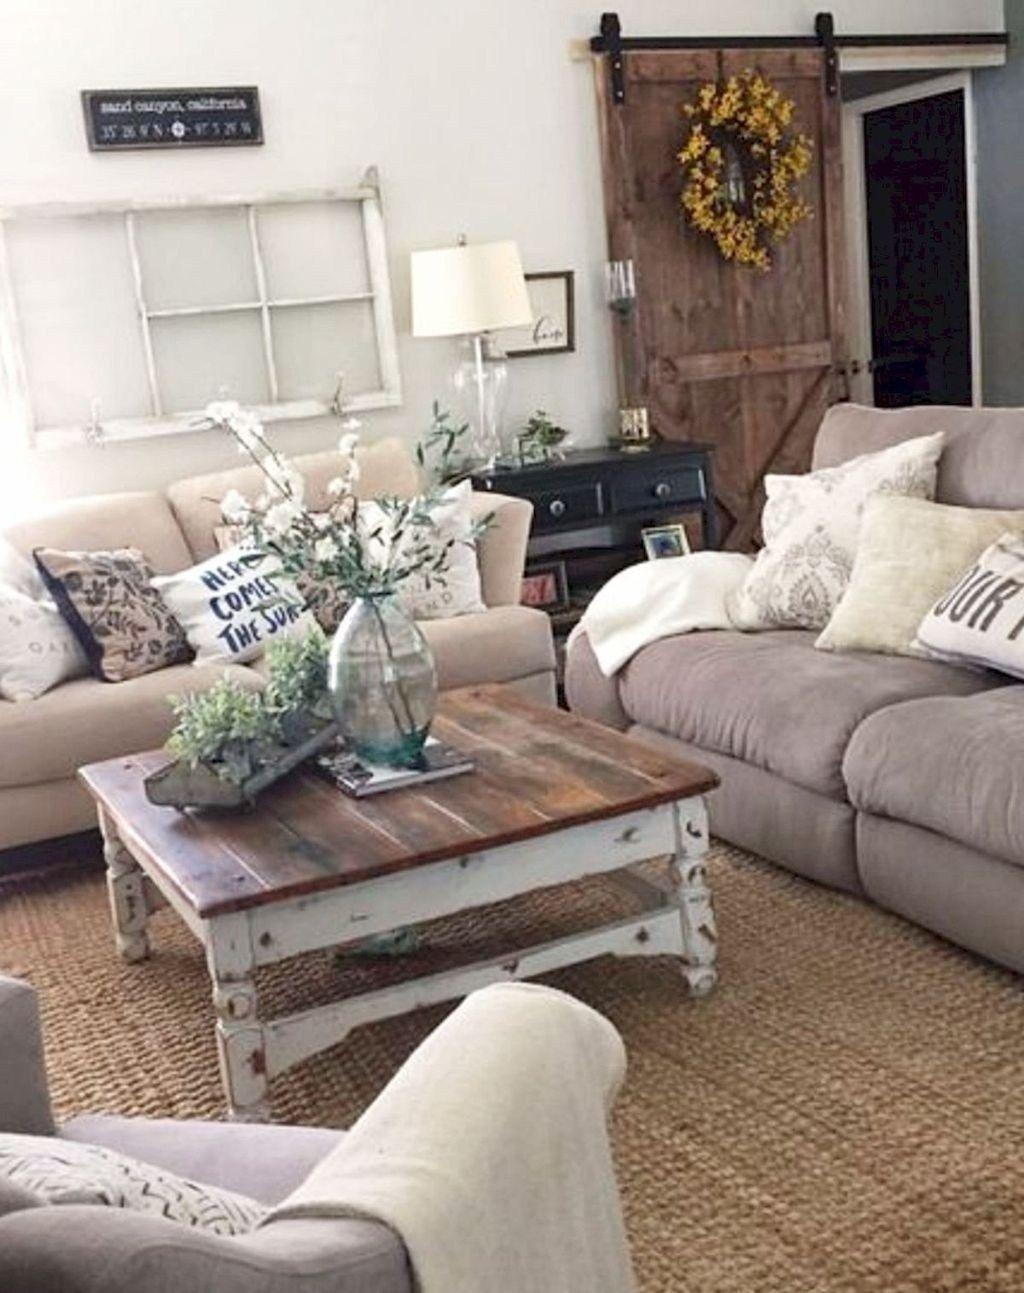 catchy farmhouse living room decor ideas that make you feel in village04 catchy farmhouse living room decor ideas that make you feel in village04 interior